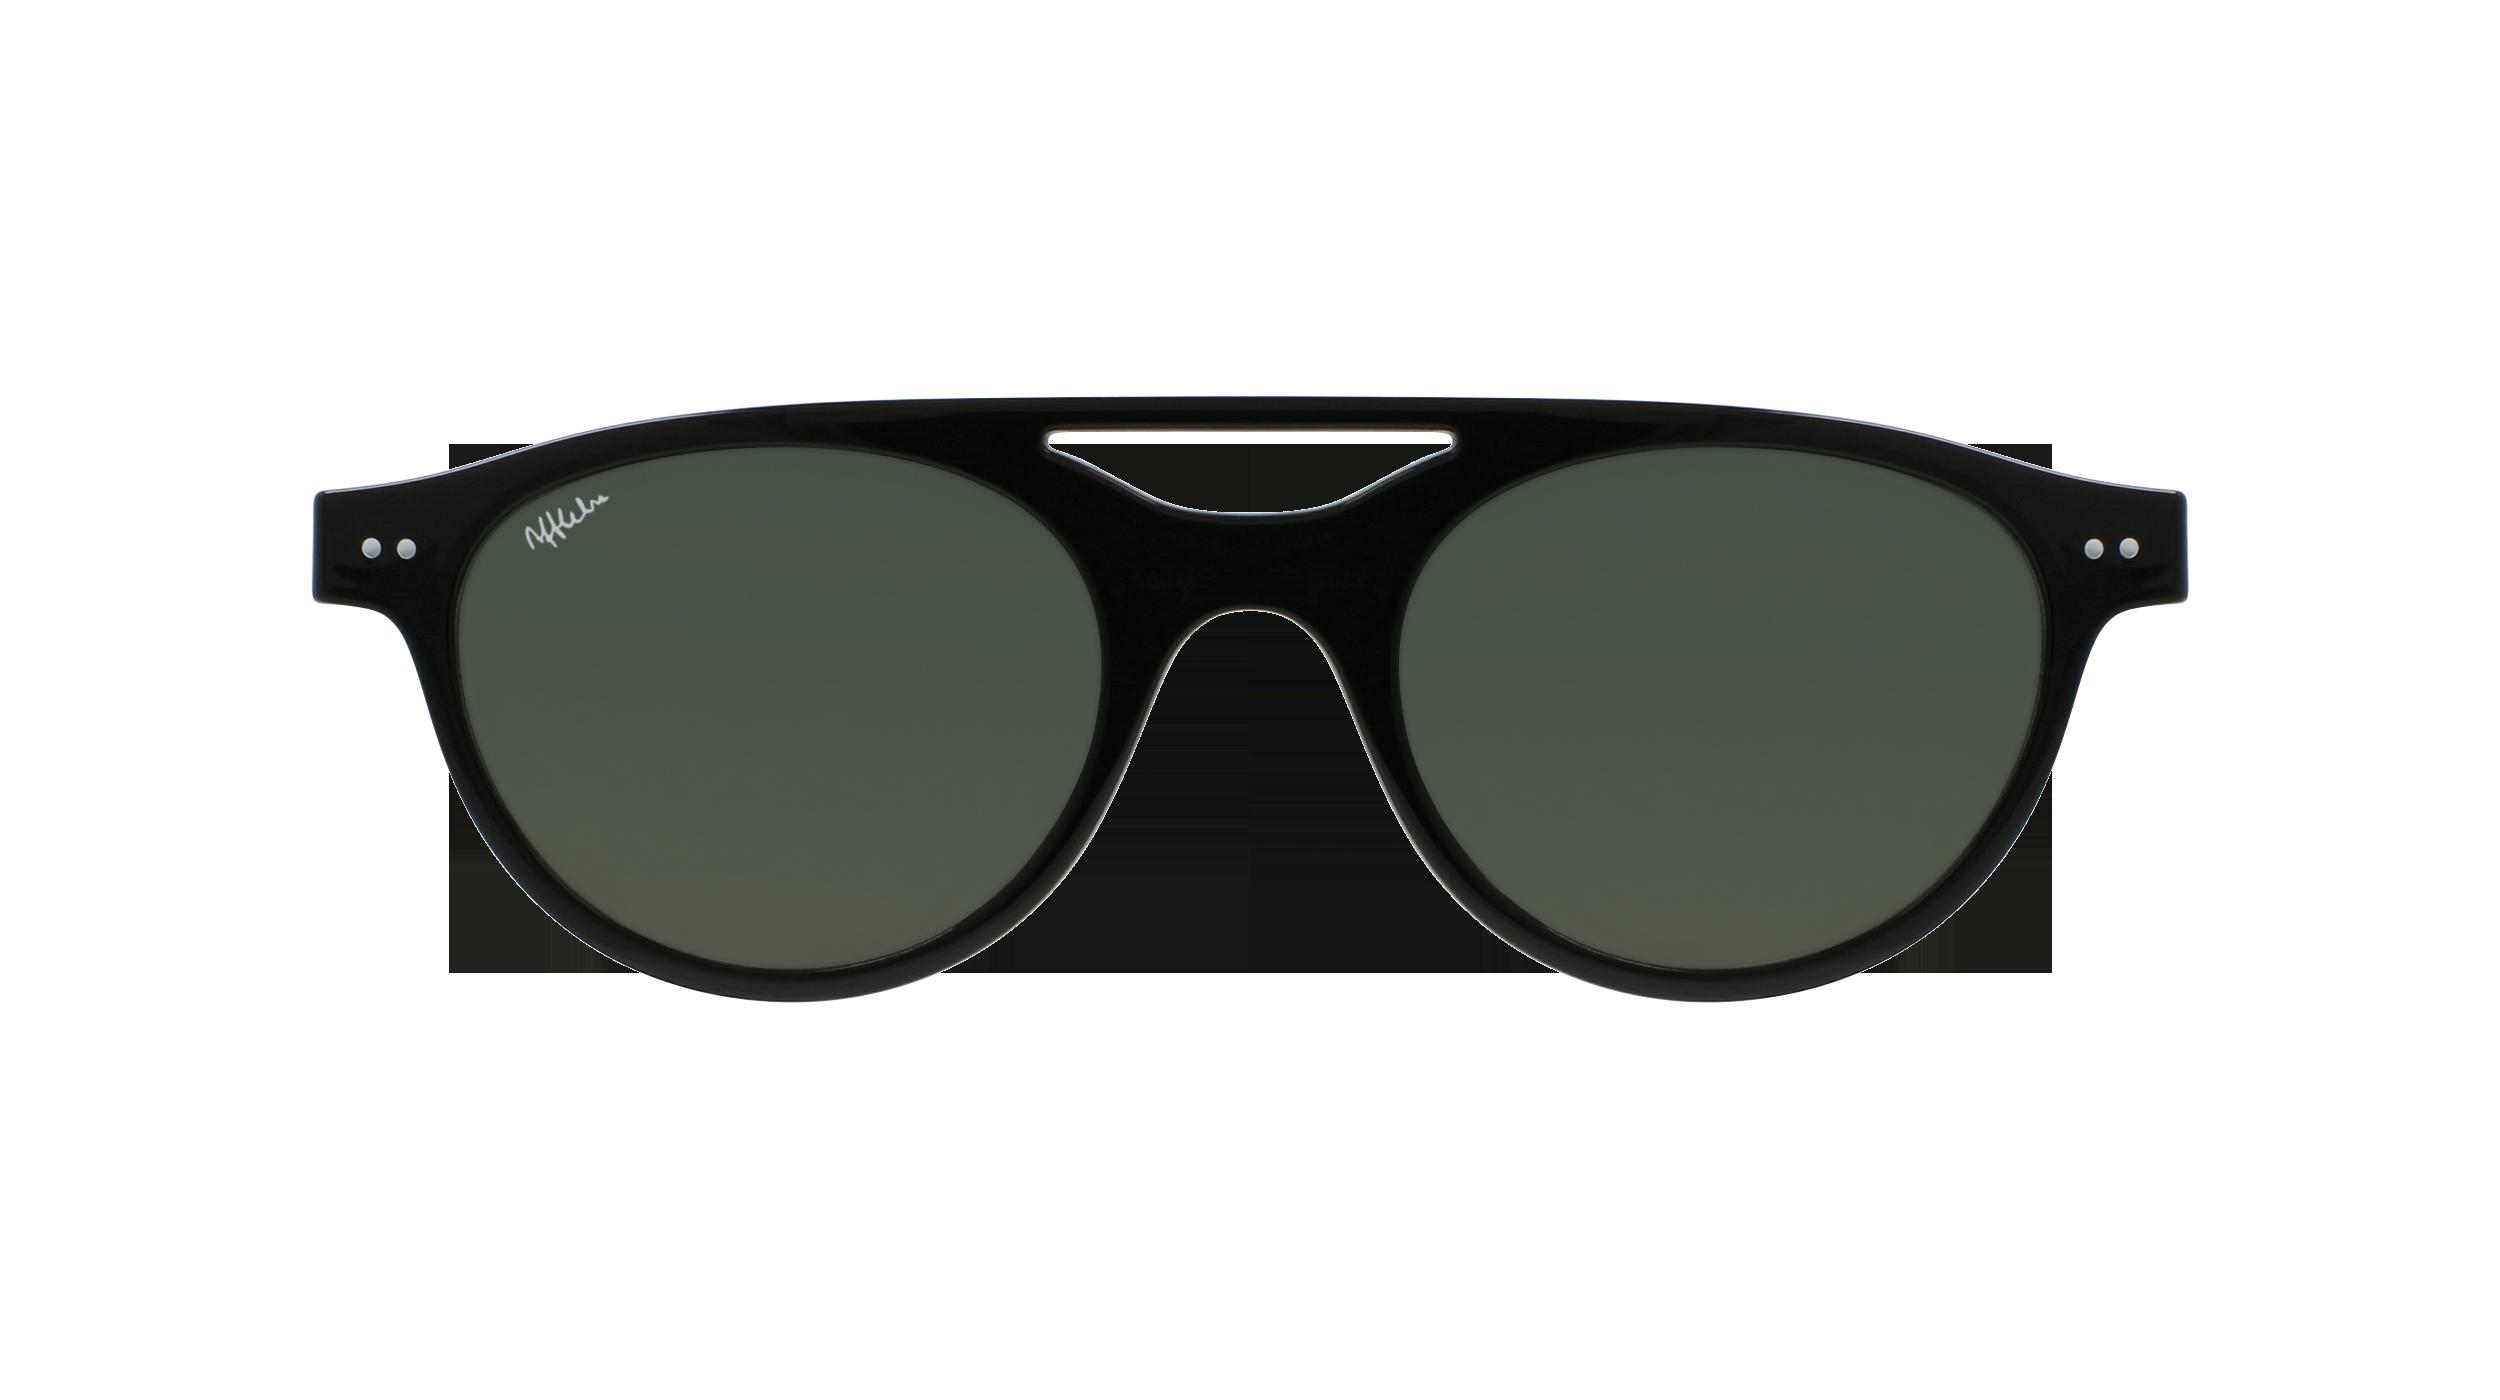 afflelou/france/products/smart_clip/clips_glasses/07630036436158.png